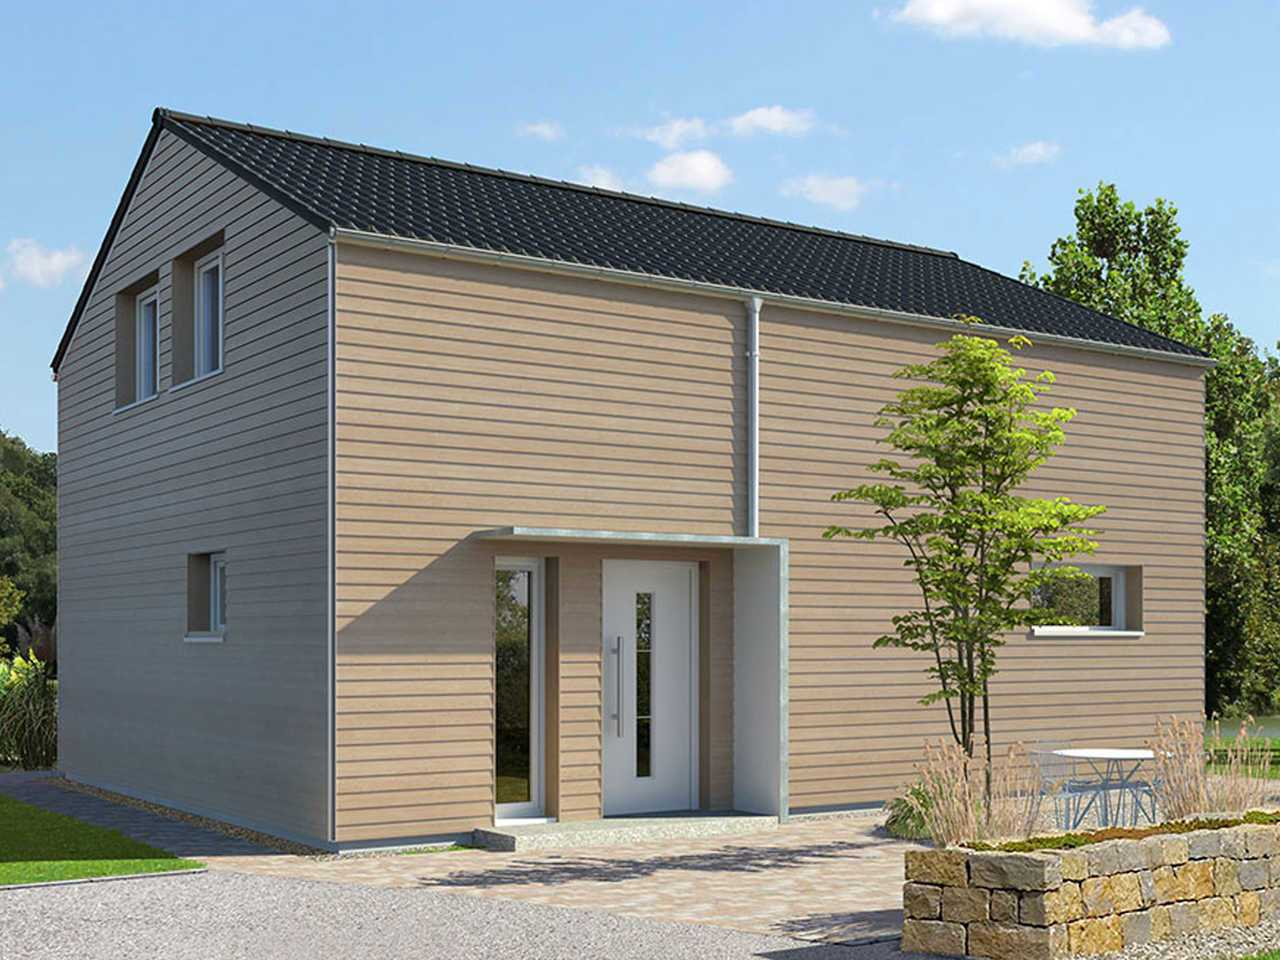 KitzlingerHaus - Kitzlinger Haus Easy